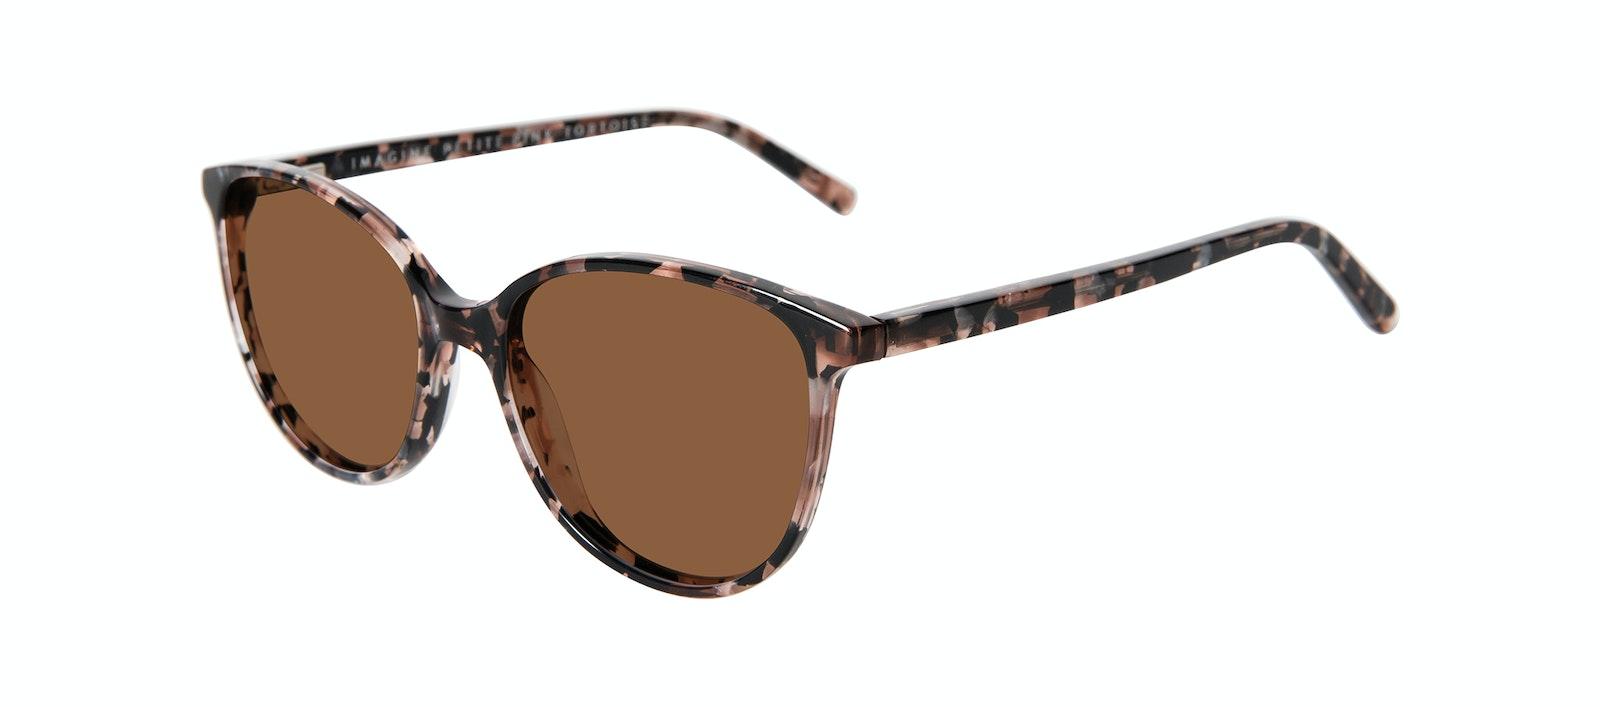 Affordable Fashion Glasses Round Sunglasses Women Imagine Petite Pink Tortoise Tilt